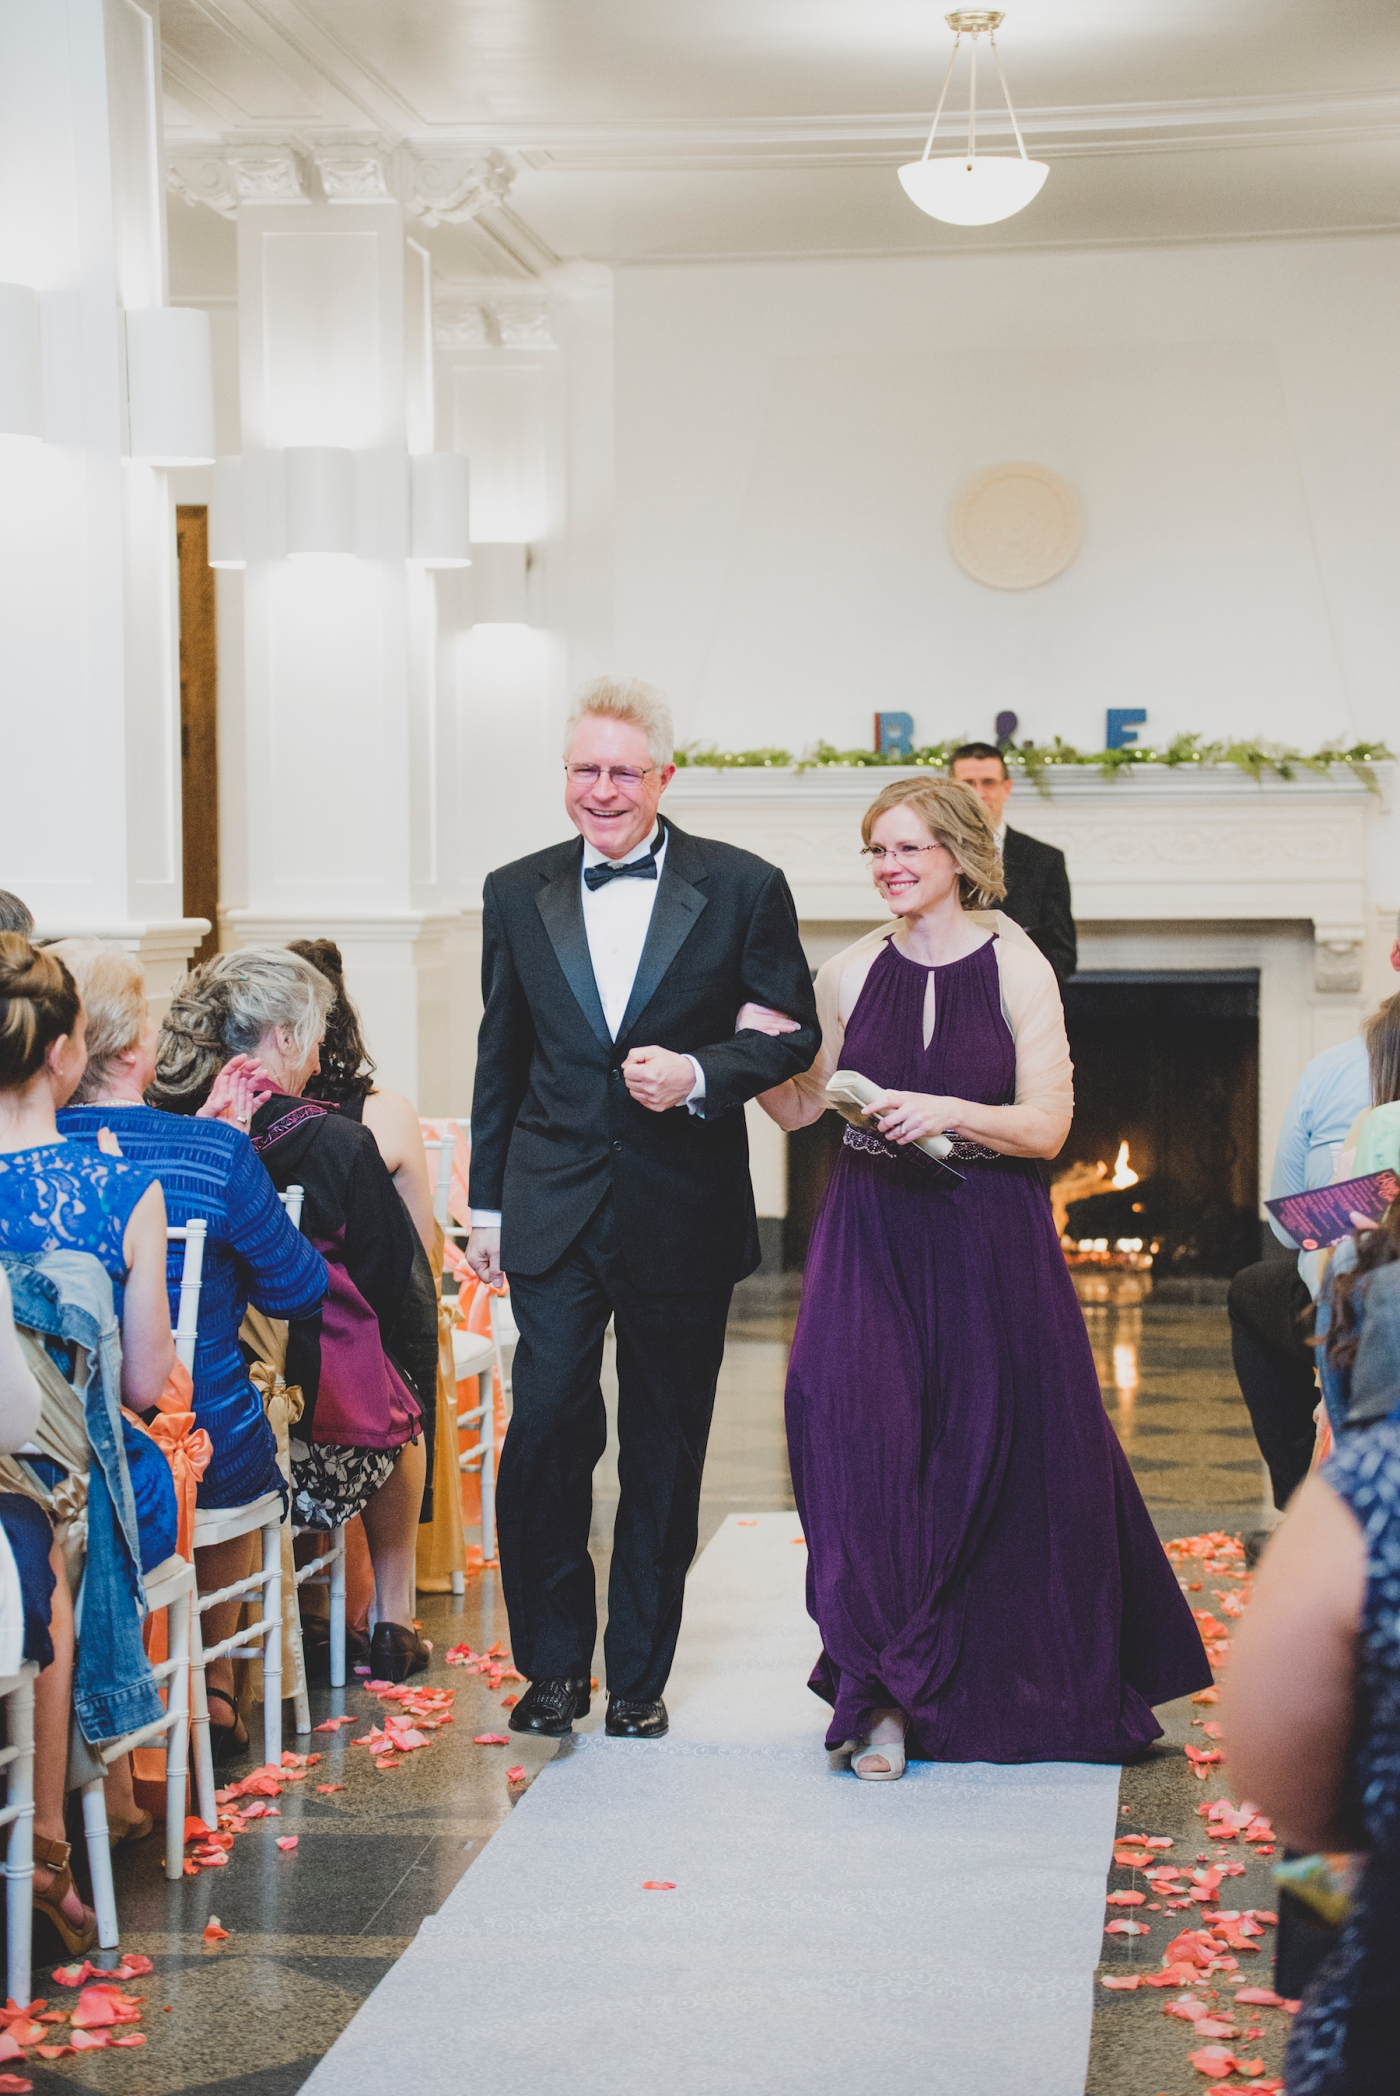 DSC_2783Everett_Wedding_Ballroom_Jane_Speleers_photography_Rachel_and_Edmund_Ceremony_2017